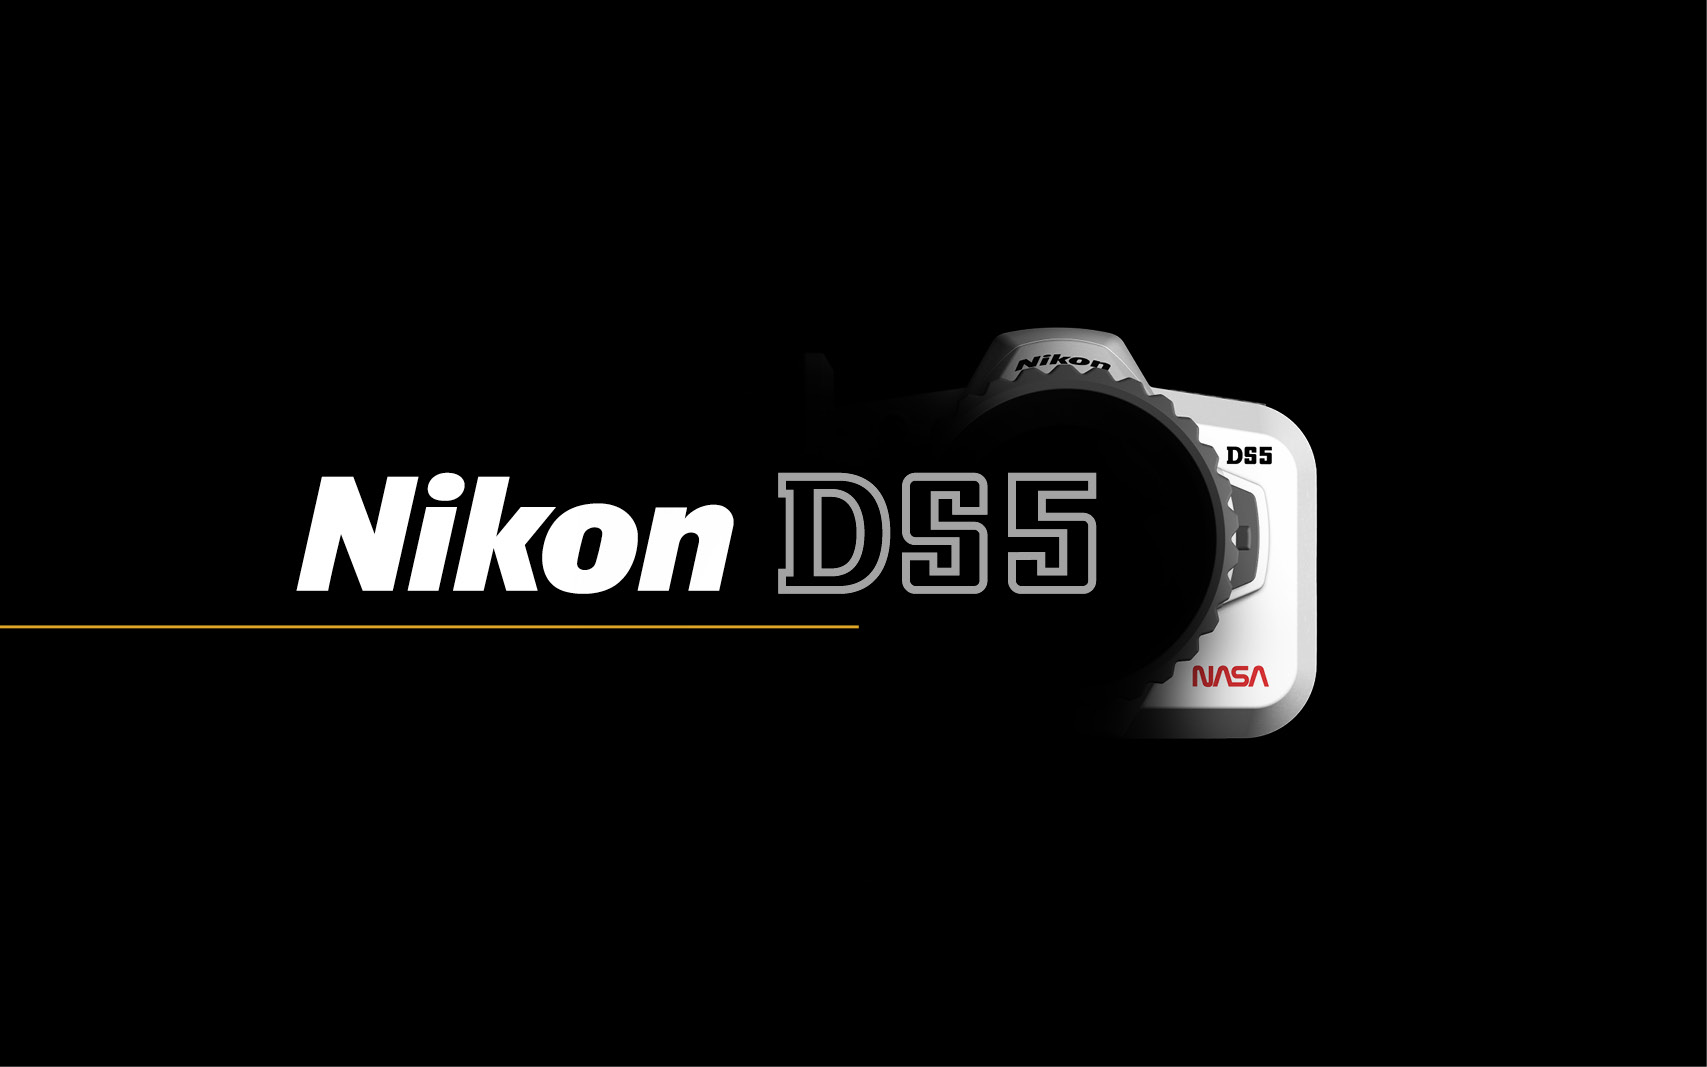 NikonDS5_Web.jpg